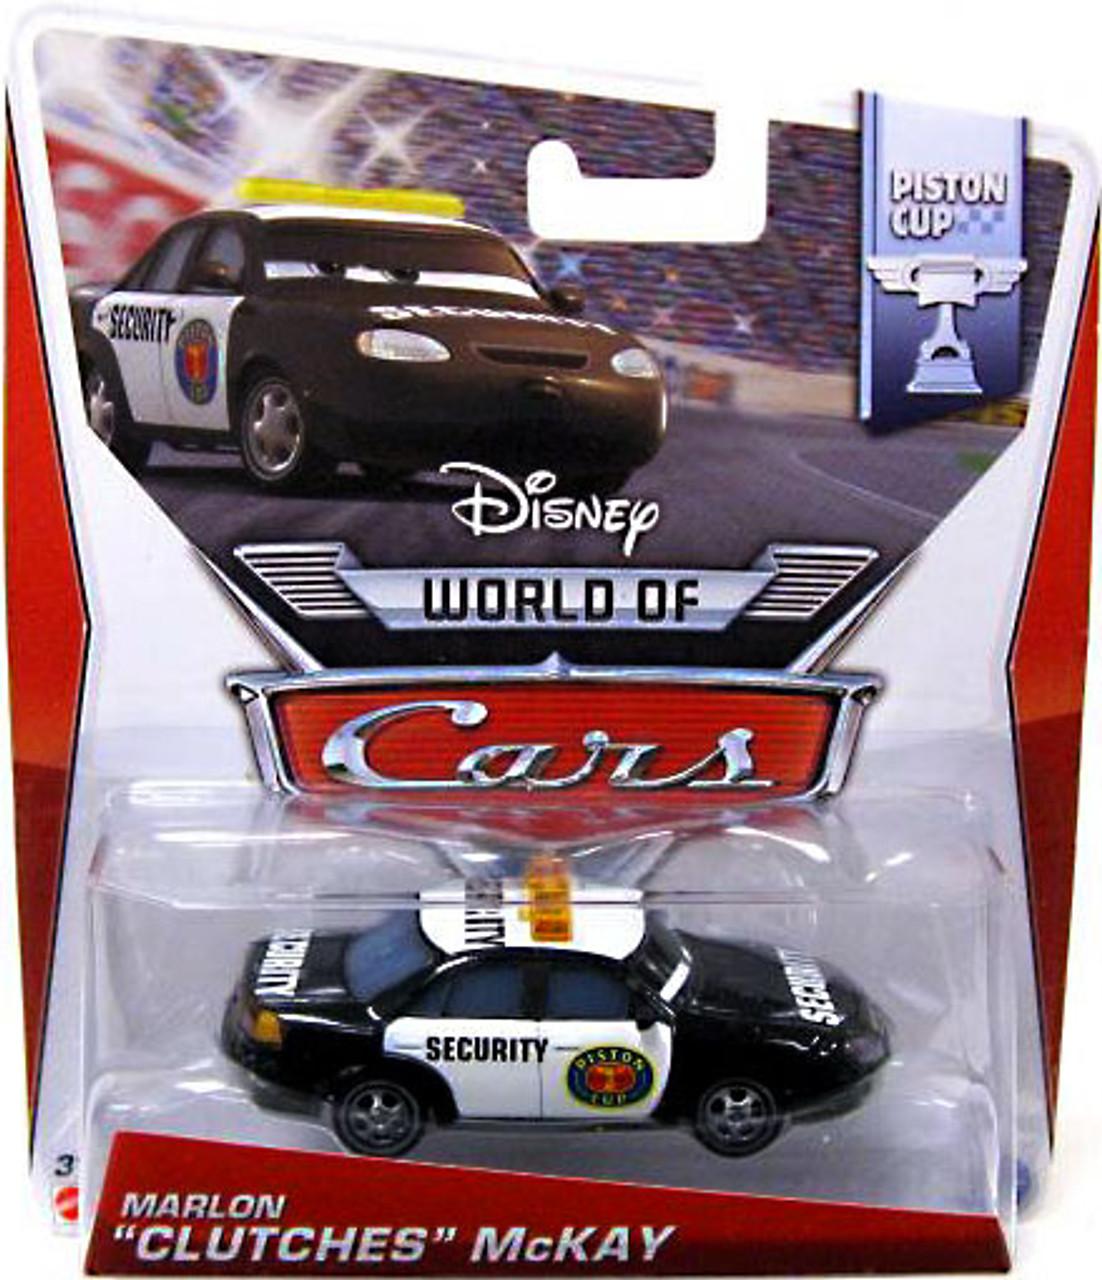 Disney Pixar Cars Movie 155 Die Cast Car Oversized Vehicle Richard